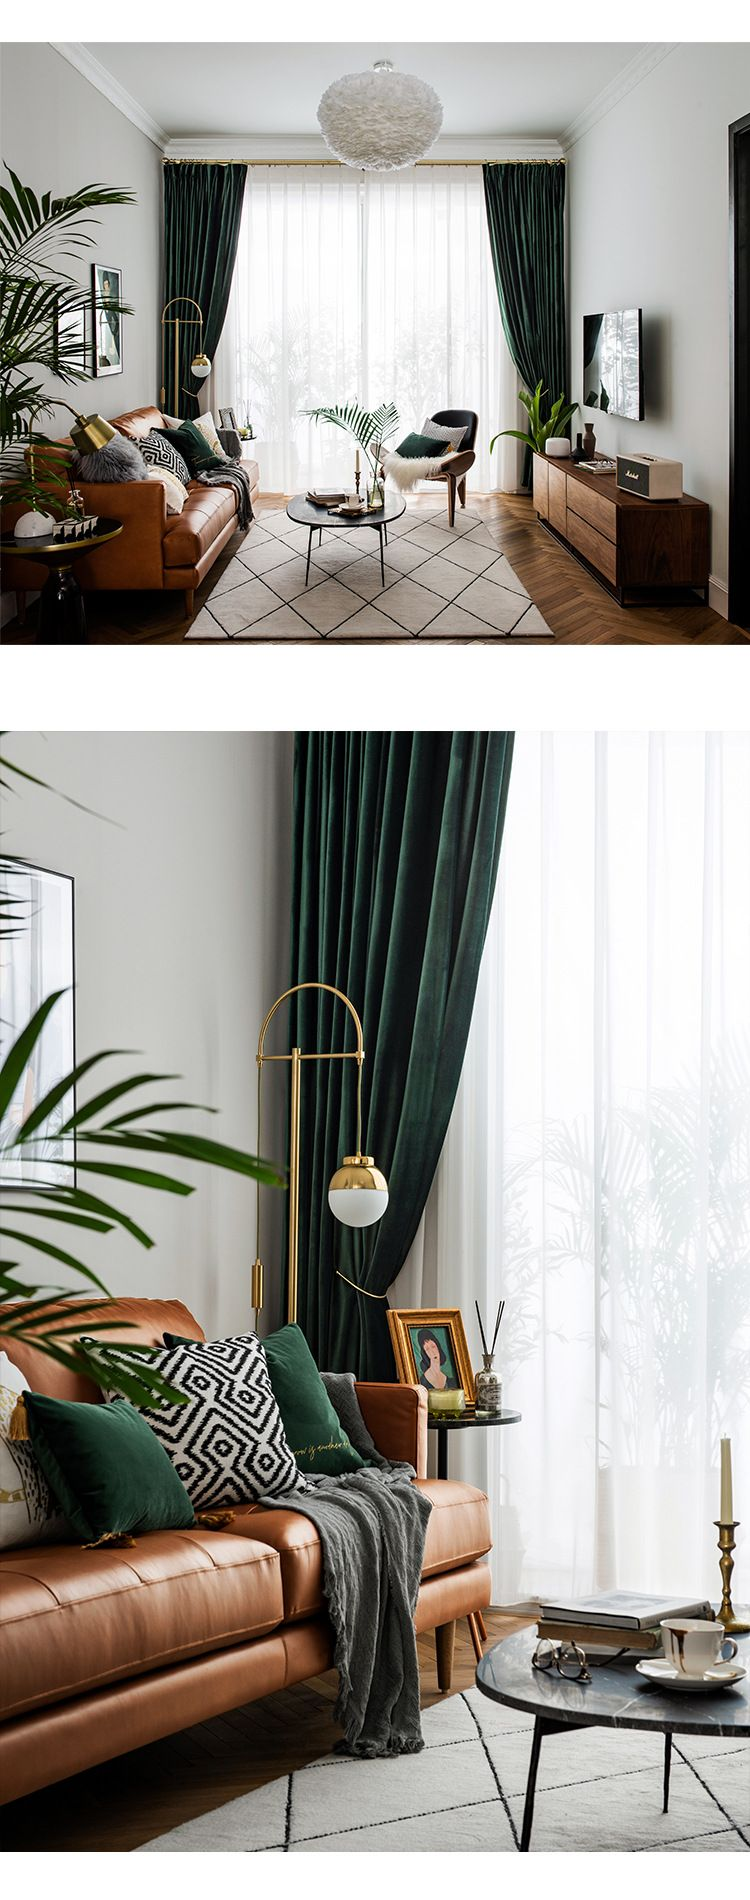 US $10.0 |Nordic Velvet Curtains Dark Green Velvet Curtains Blaclout Curtains Solid Color Curtains for Bedroom Living Room Dining Room|Curtains|- AliExpress